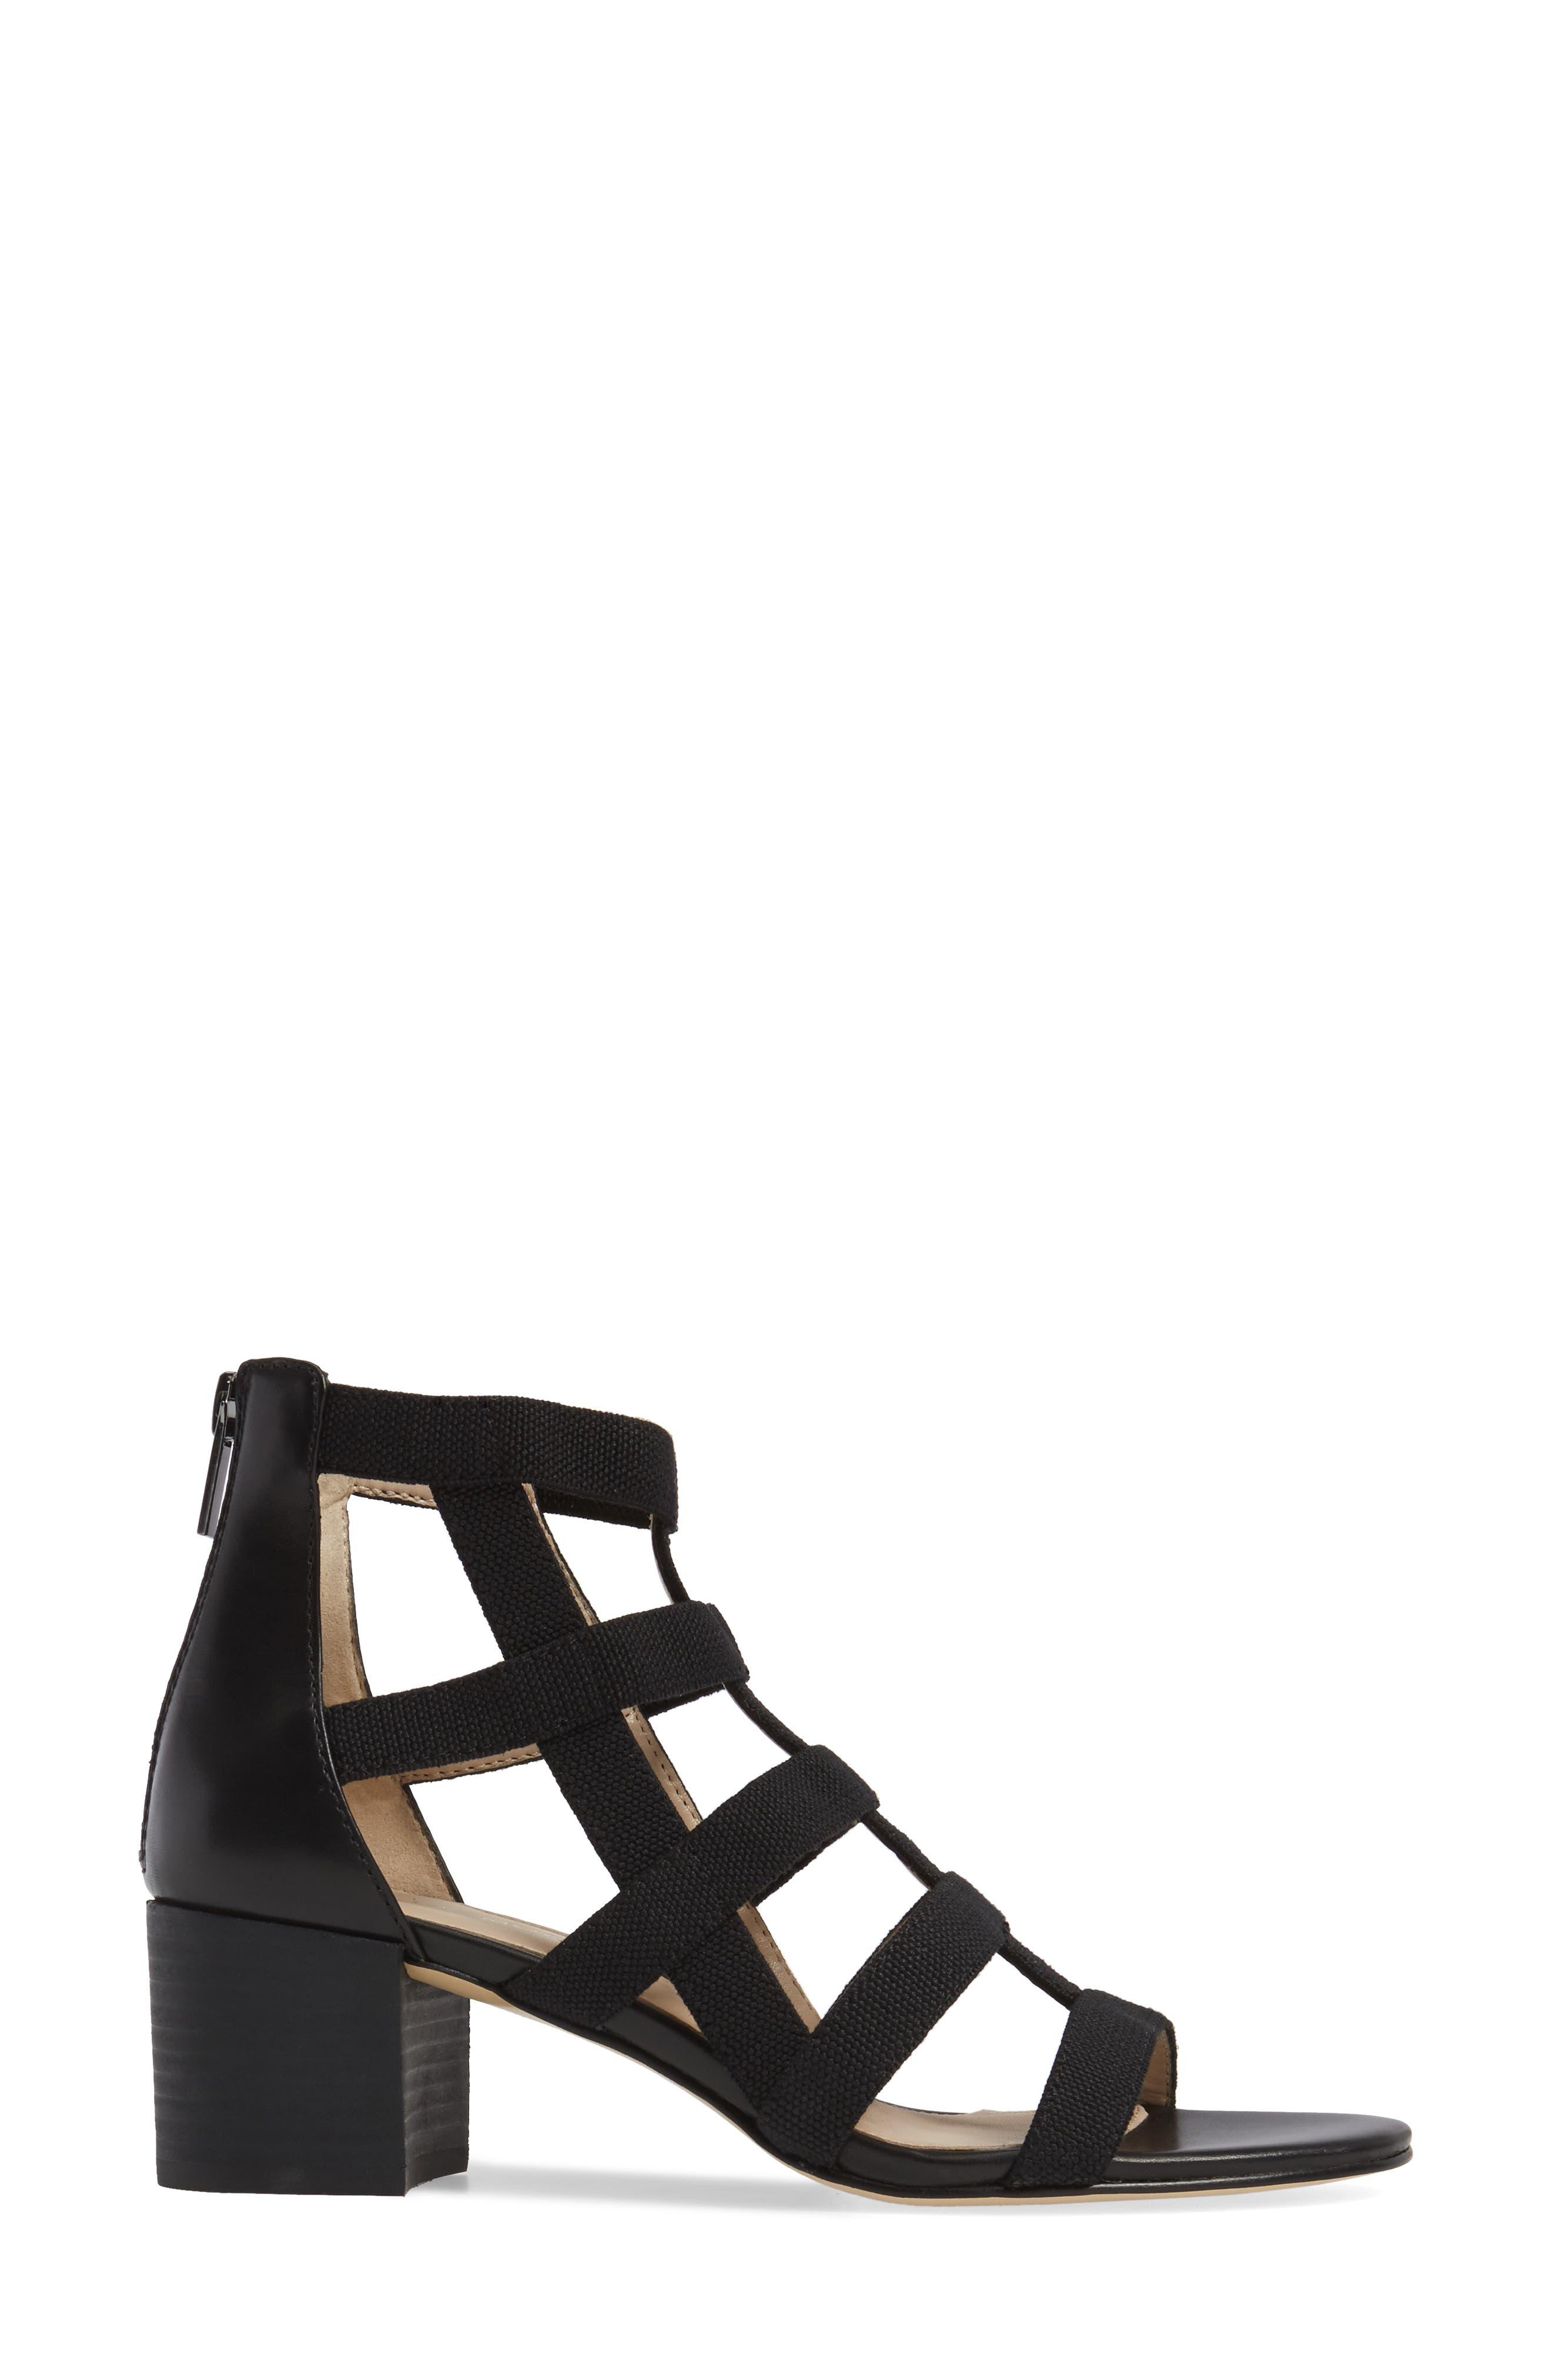 Unkar Block Heel Sandal,                             Alternate thumbnail 3, color,                             001